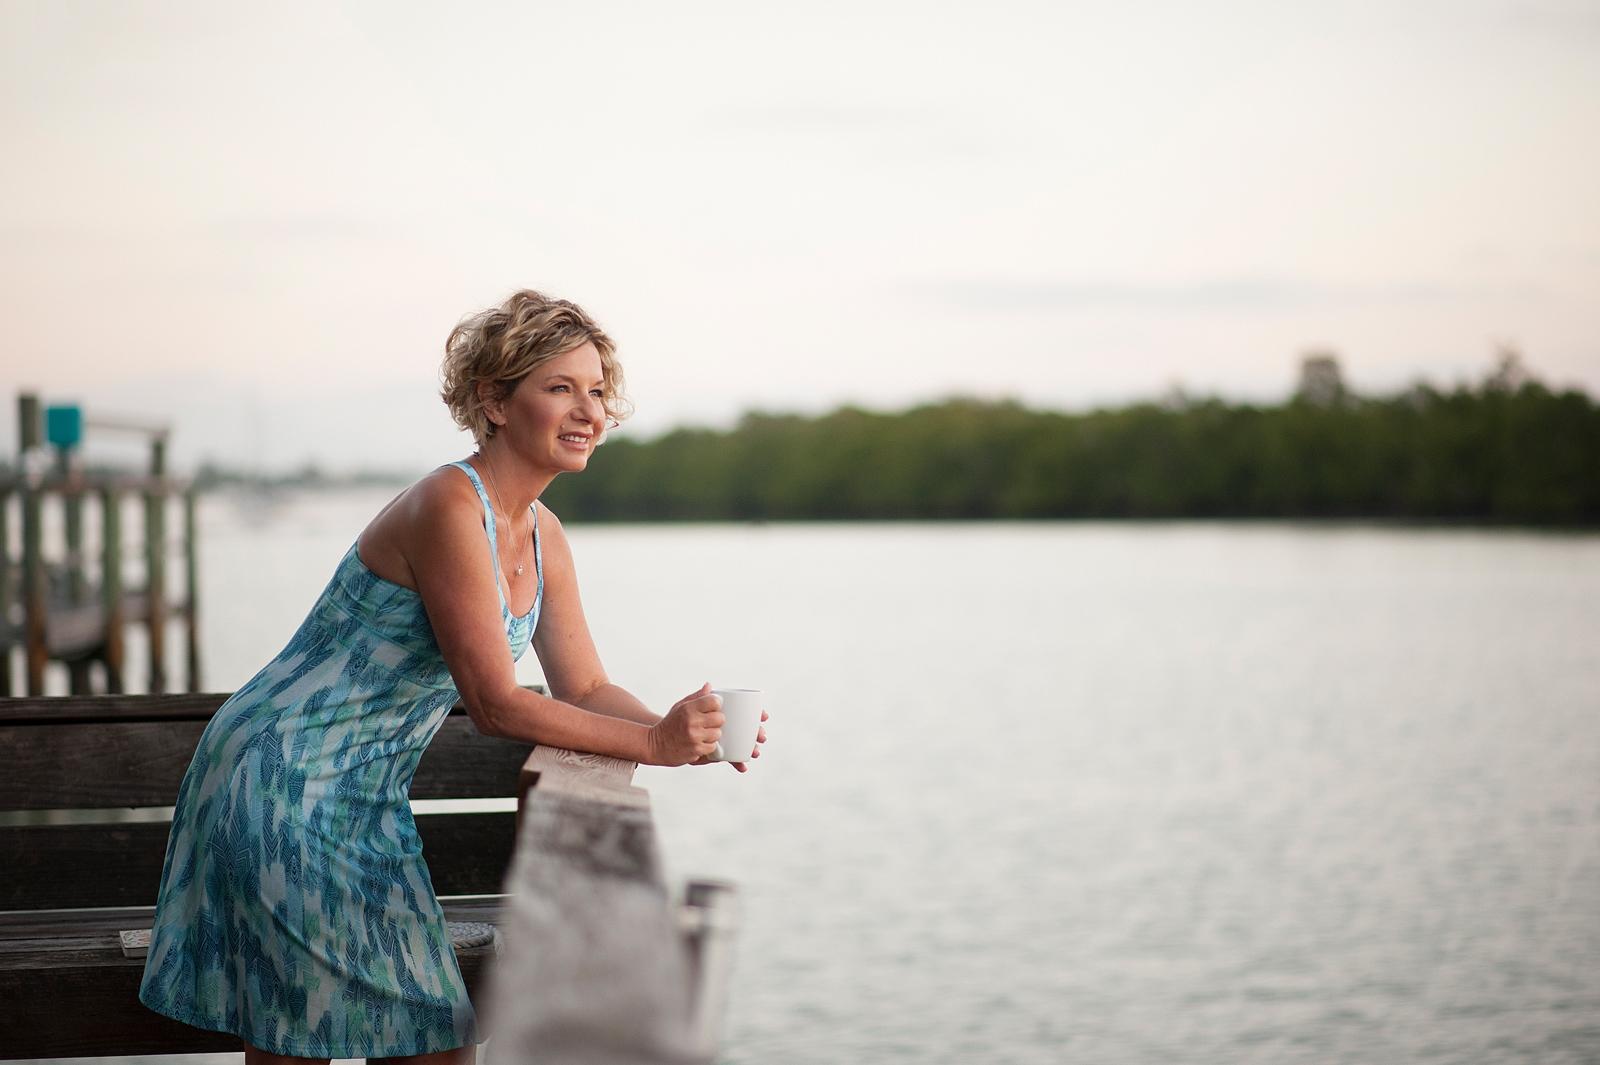 24-visionary-artist-waterfront-looking-future-coffee-mug-dress.jpg